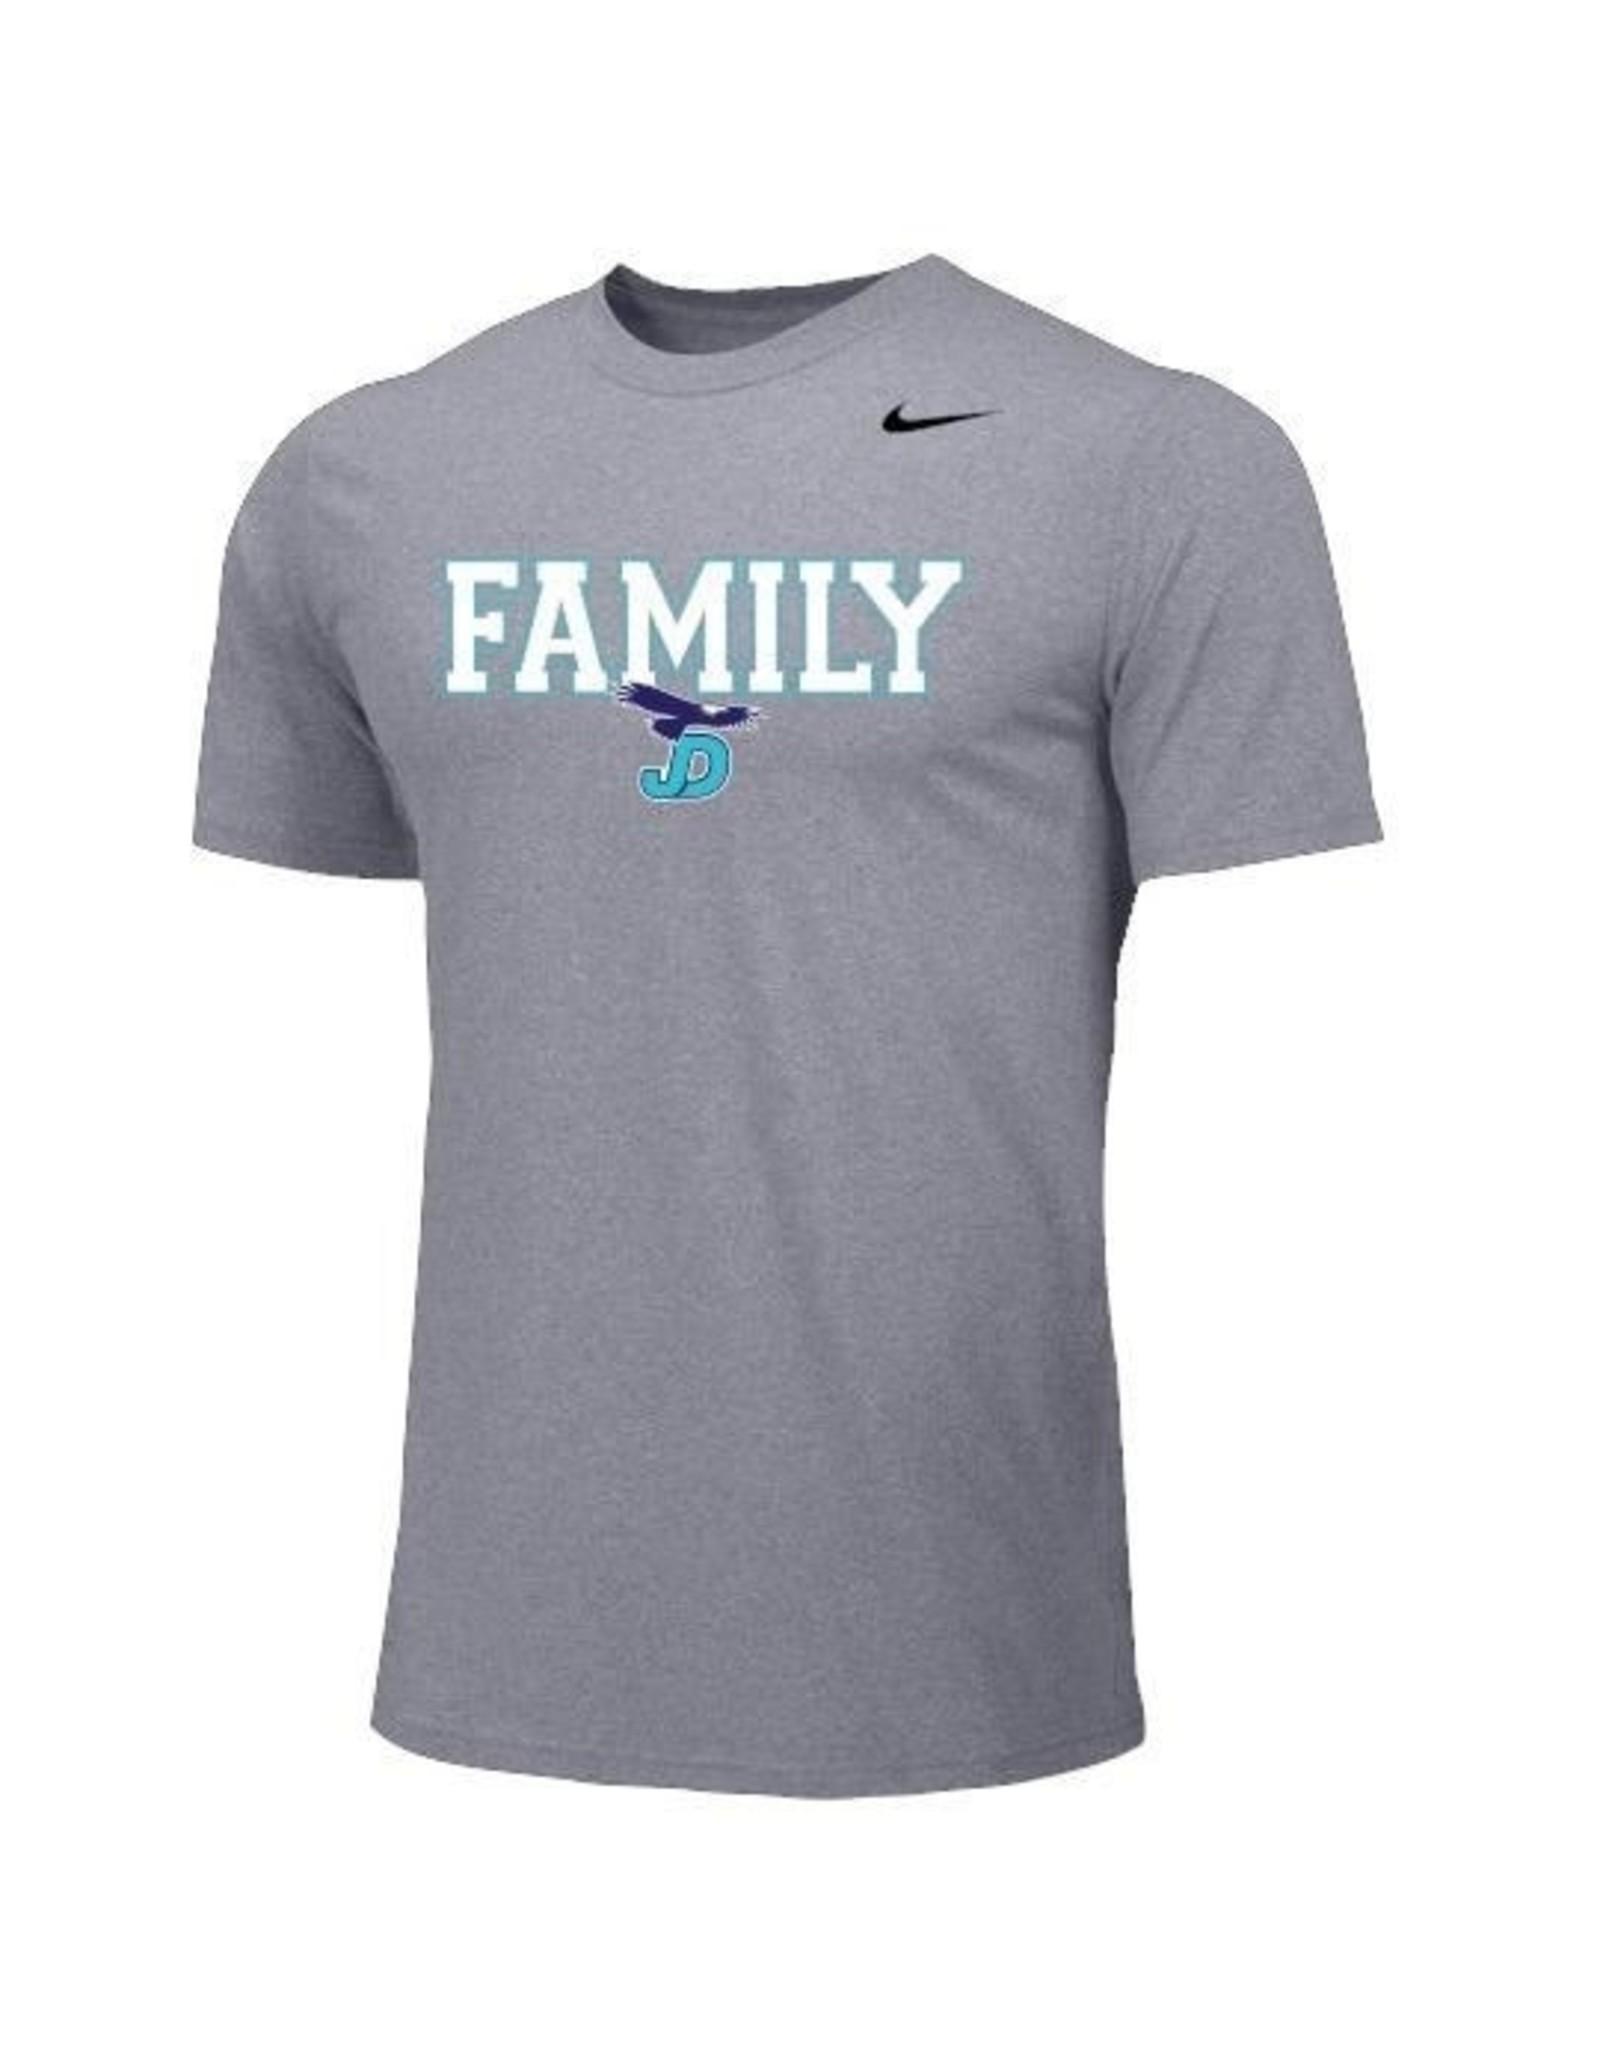 NON-UNIFORM JD NIke 'Family' Tee w/JD logo custom add sport